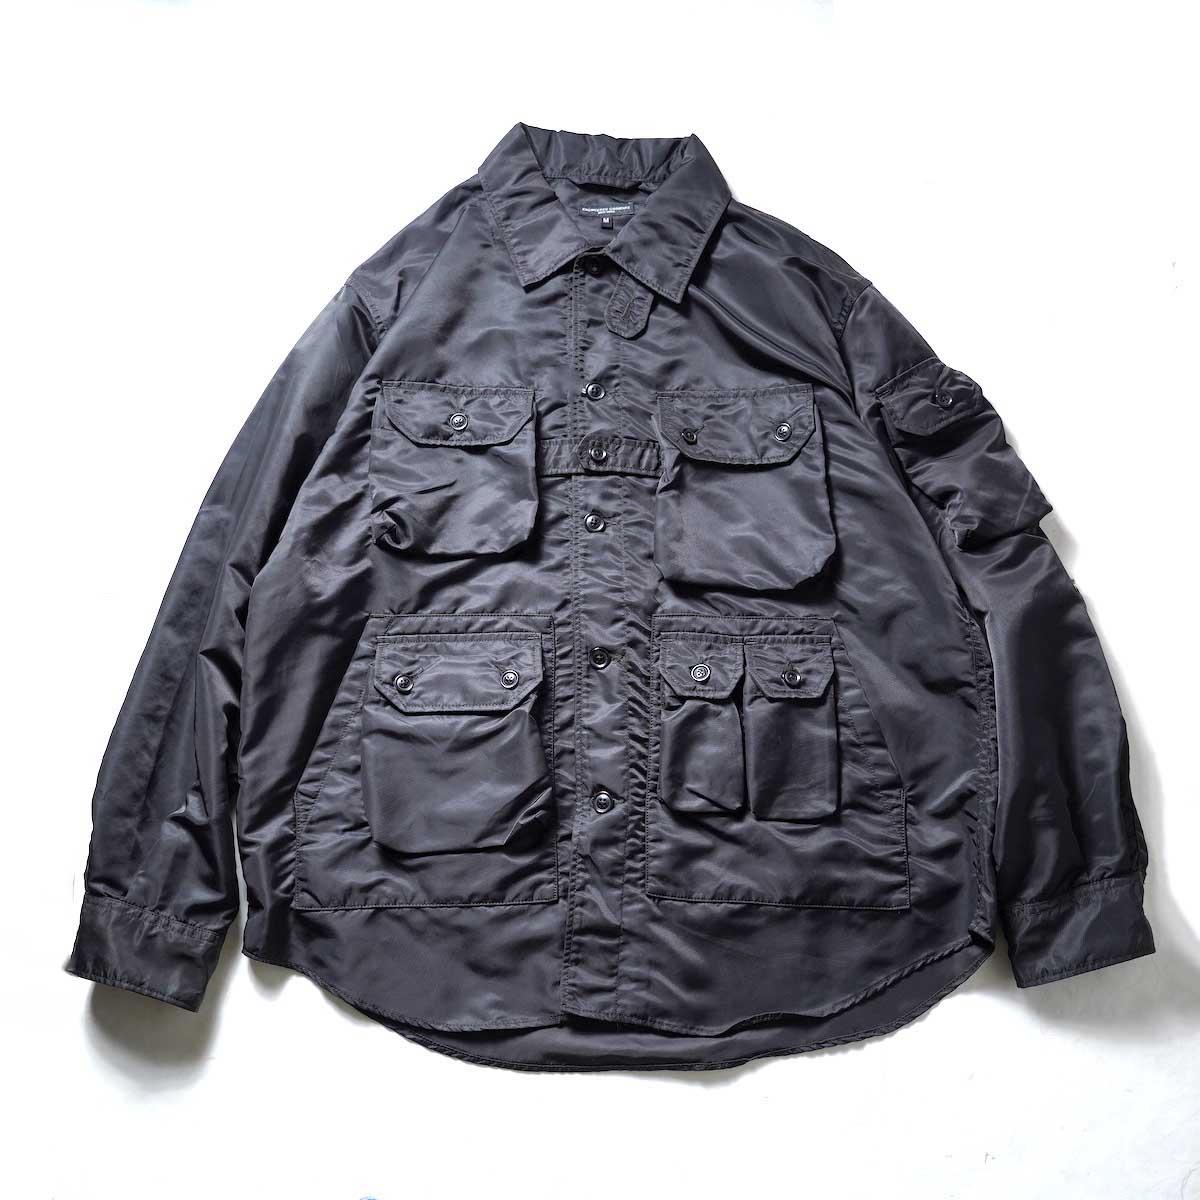 Engineered Garments / EXPLORER SHIRT JACKET - FLIGHT SATIN NYLON (Black)